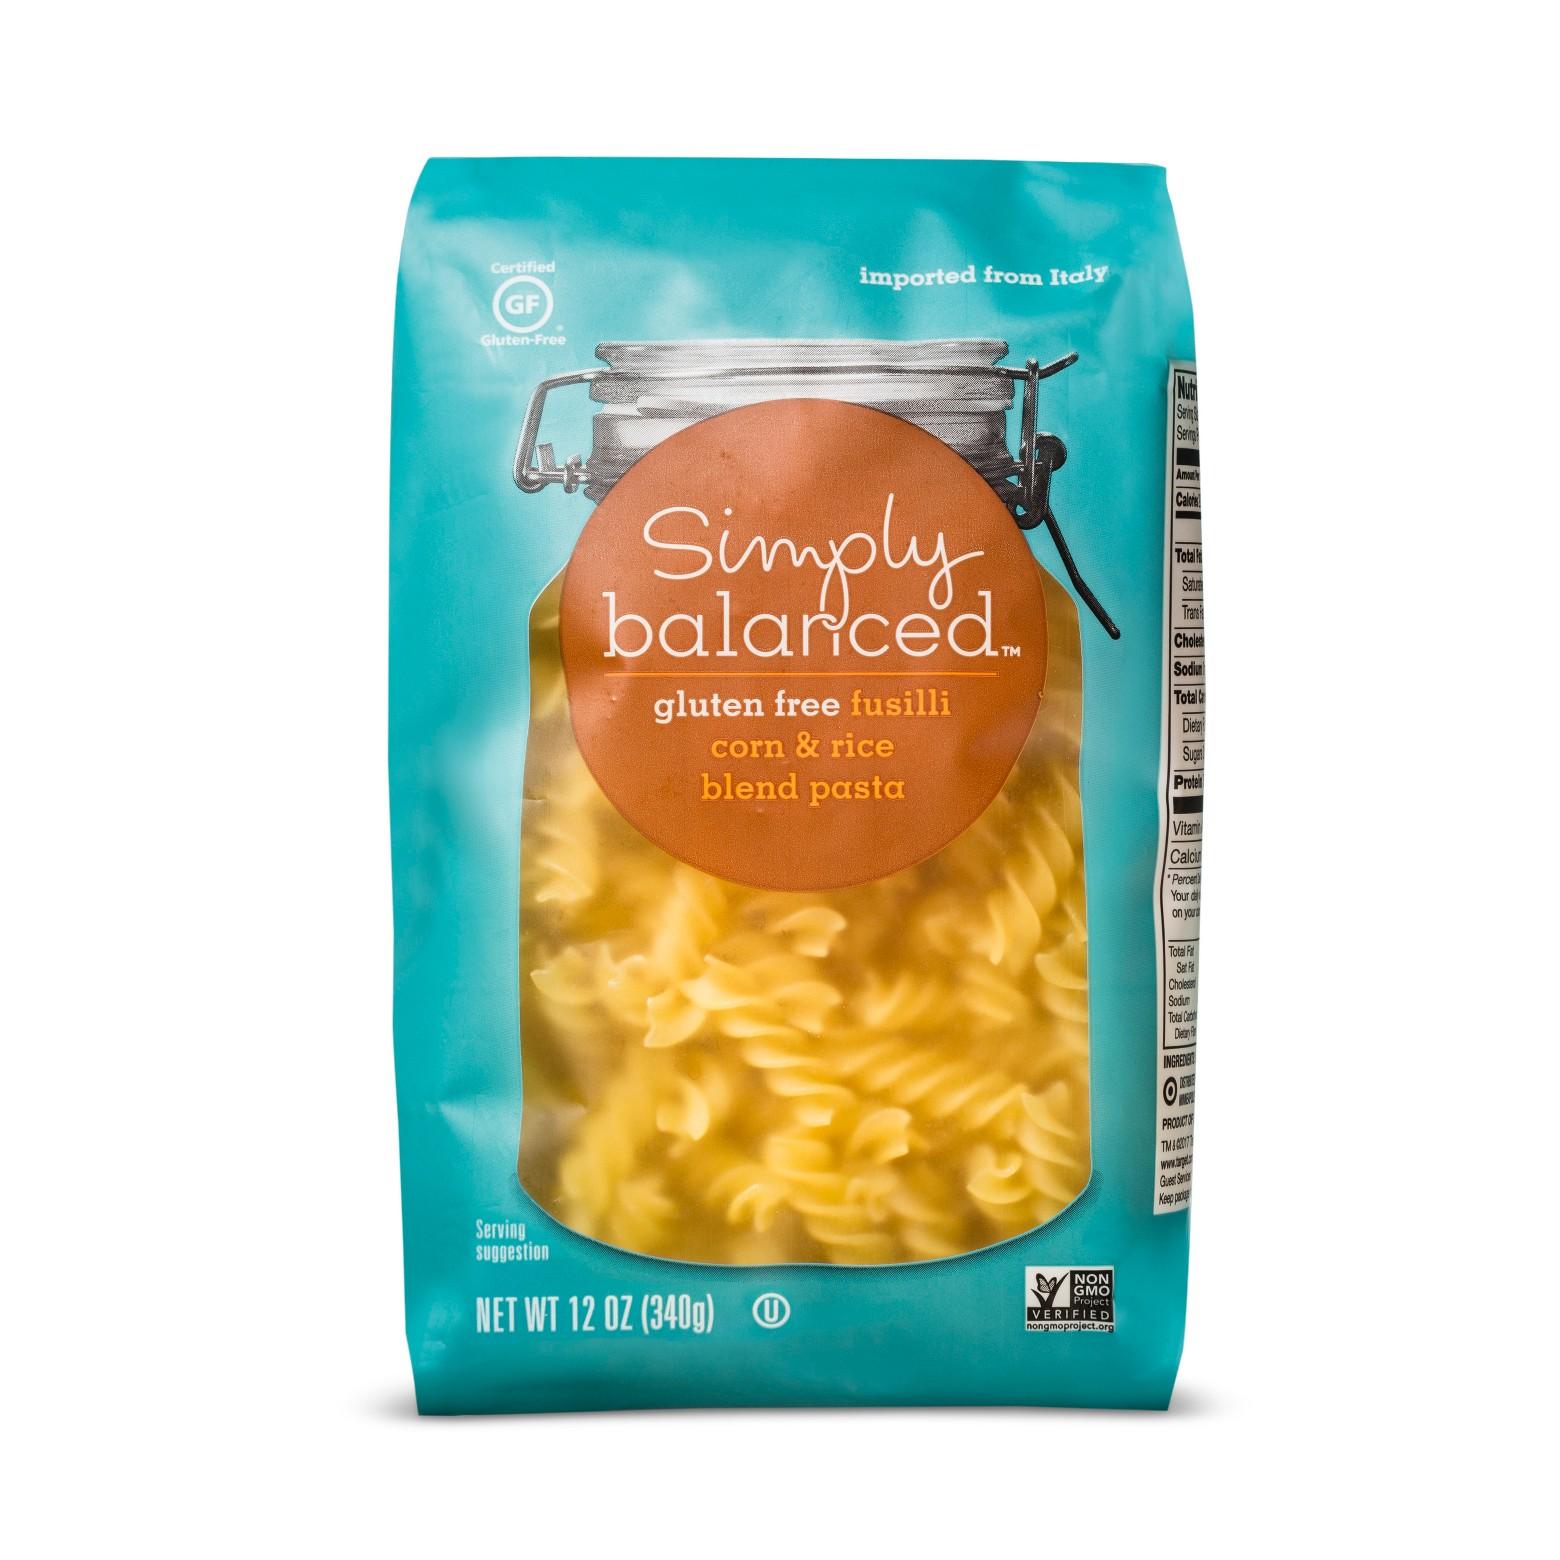 Simply Balanced GF pastas are also just as good as normal pastas.